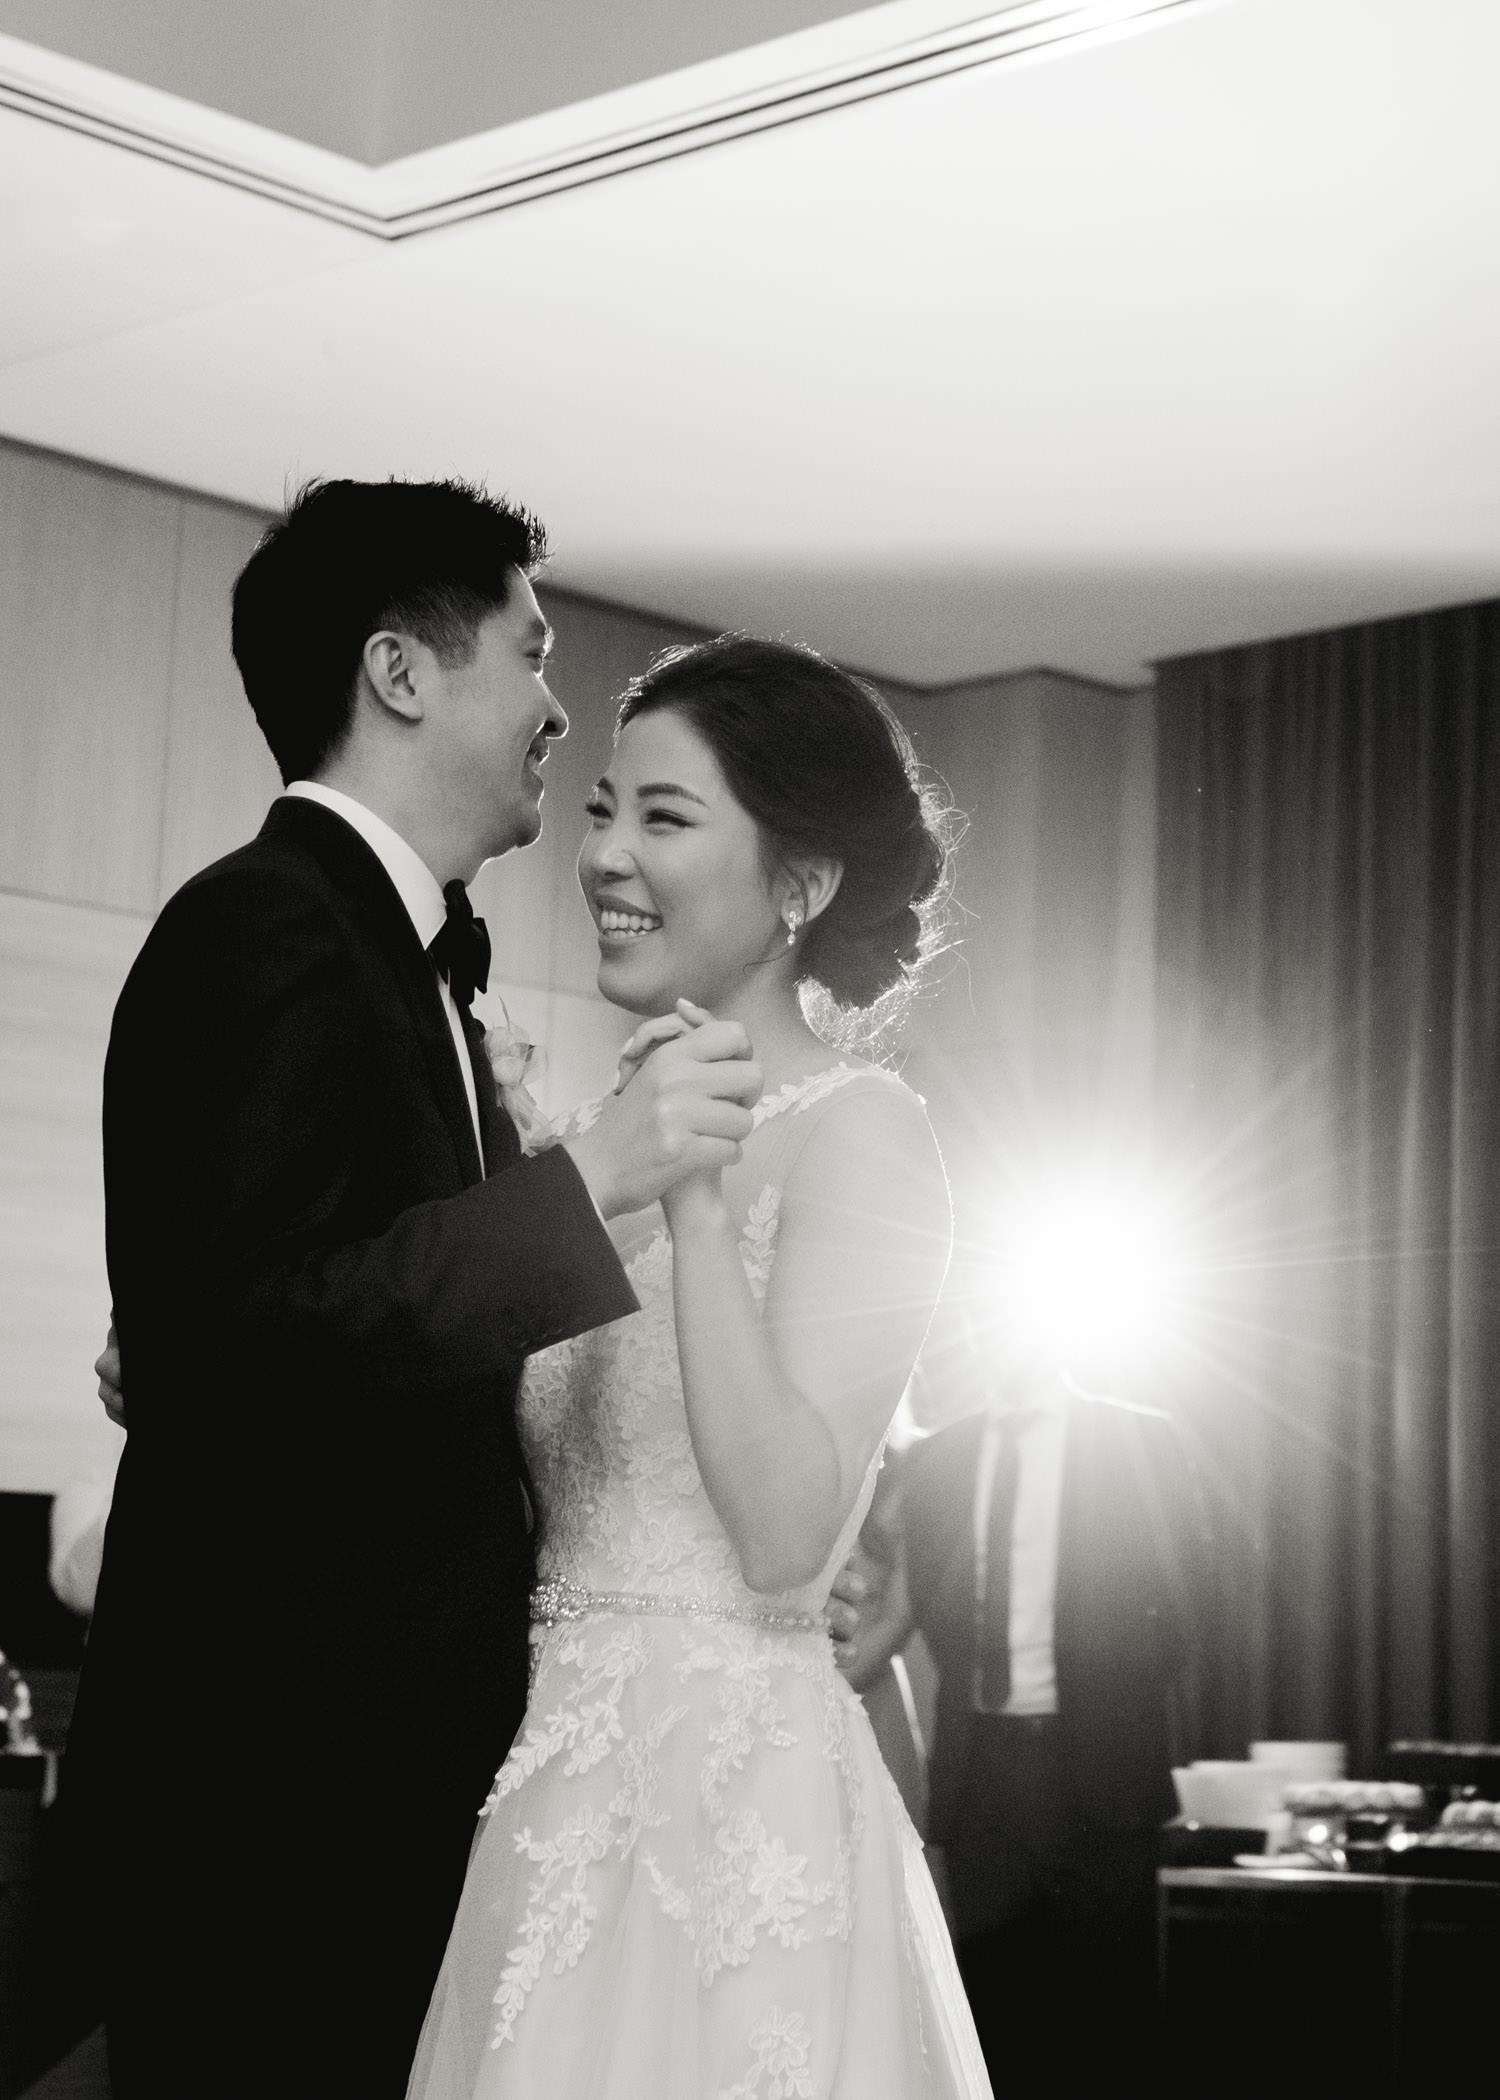 First dance at wedding in Shangri-La in Toronto